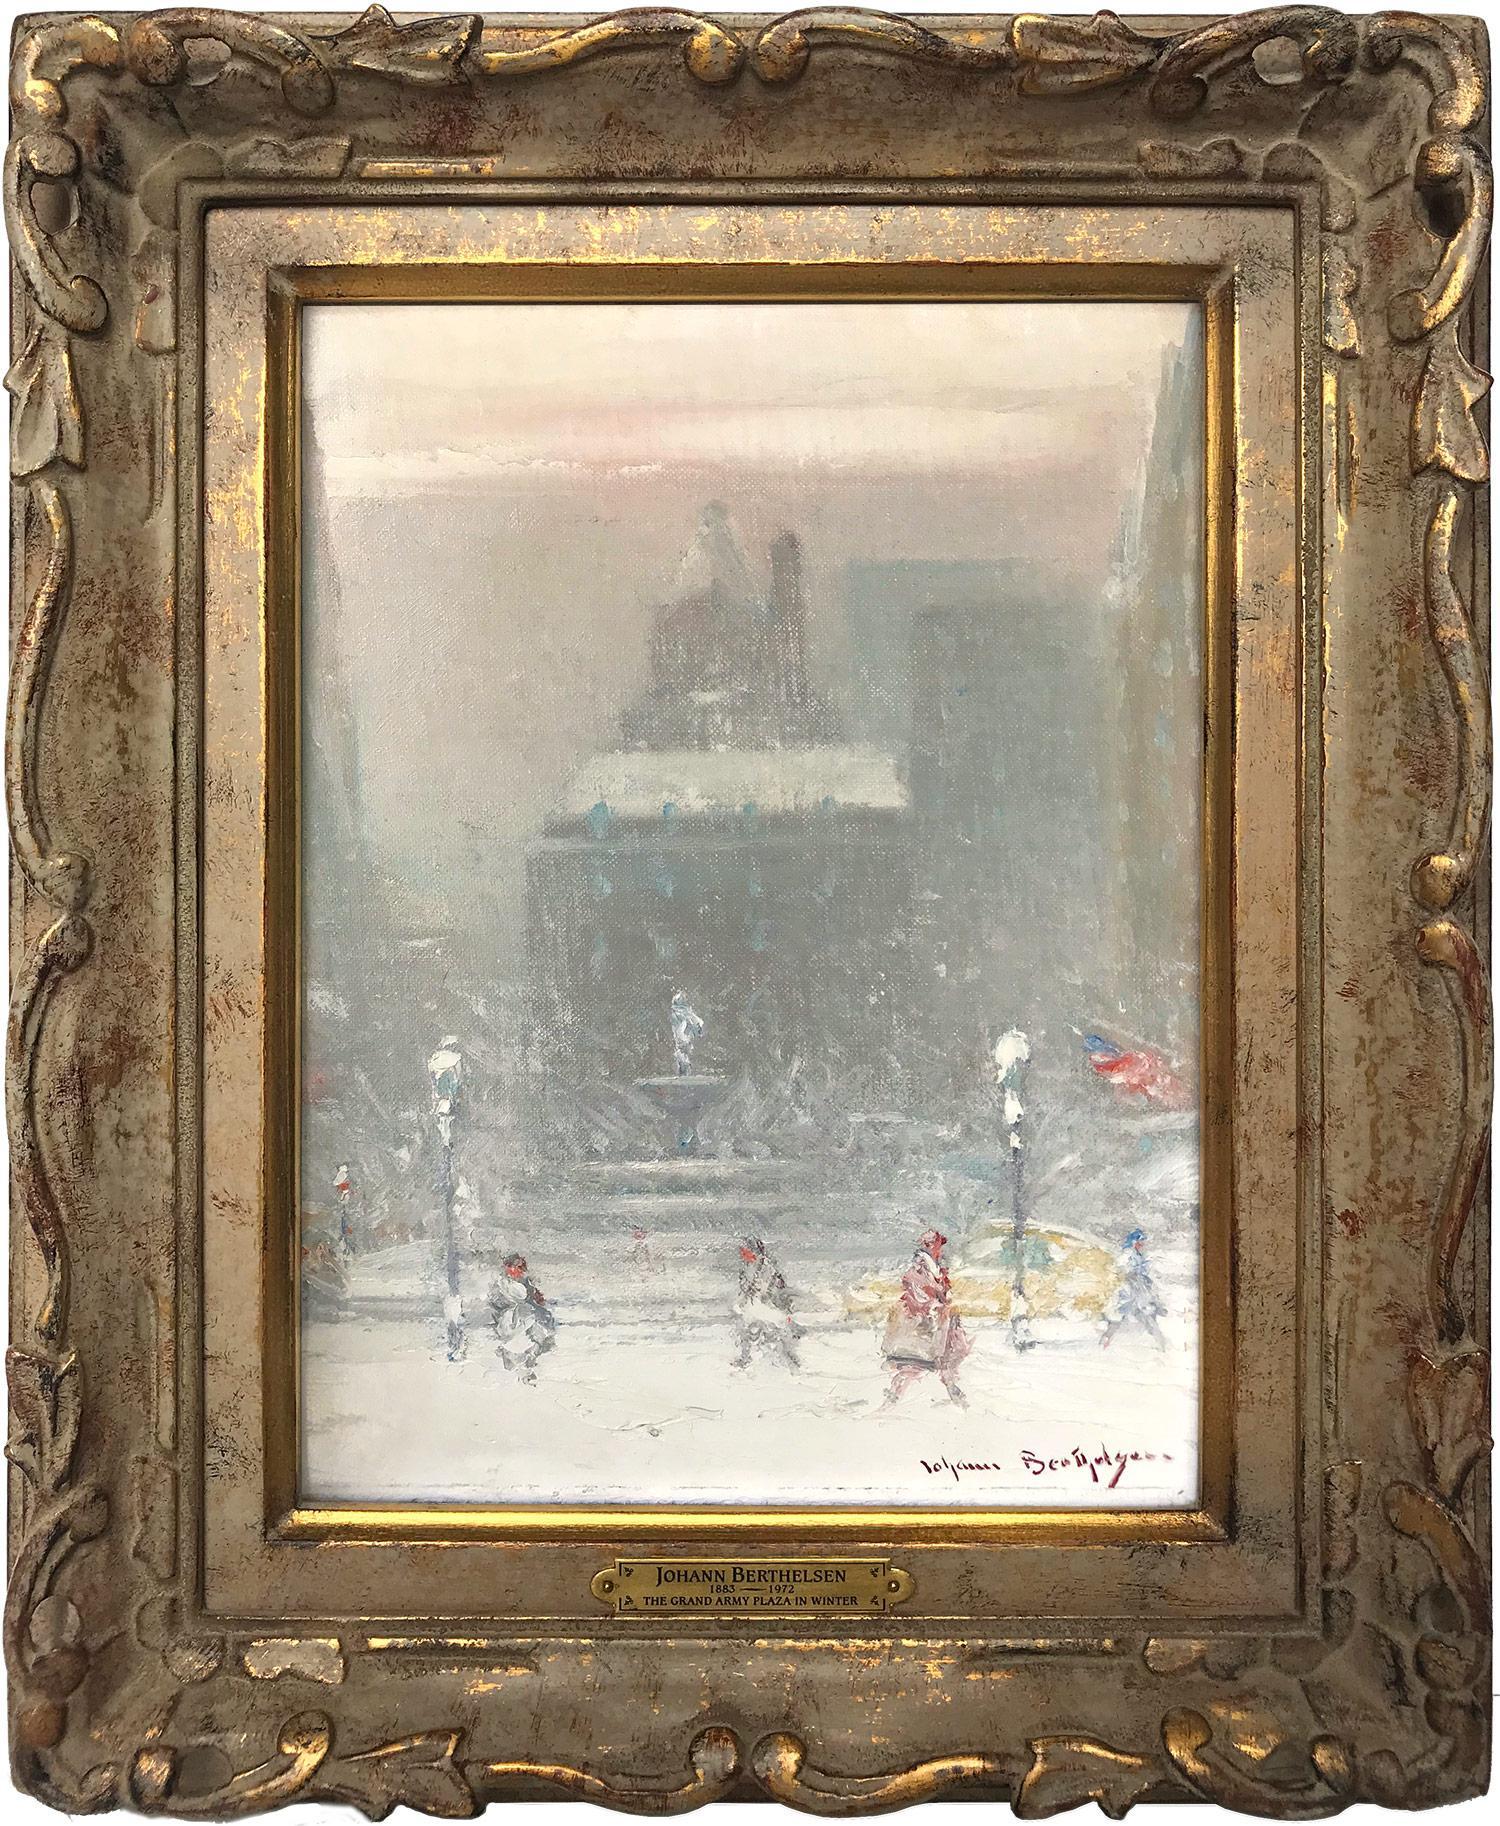 """The Grand Army Plaza in Winter"" Impressionist Winter Street Scene Oil on Canvas"